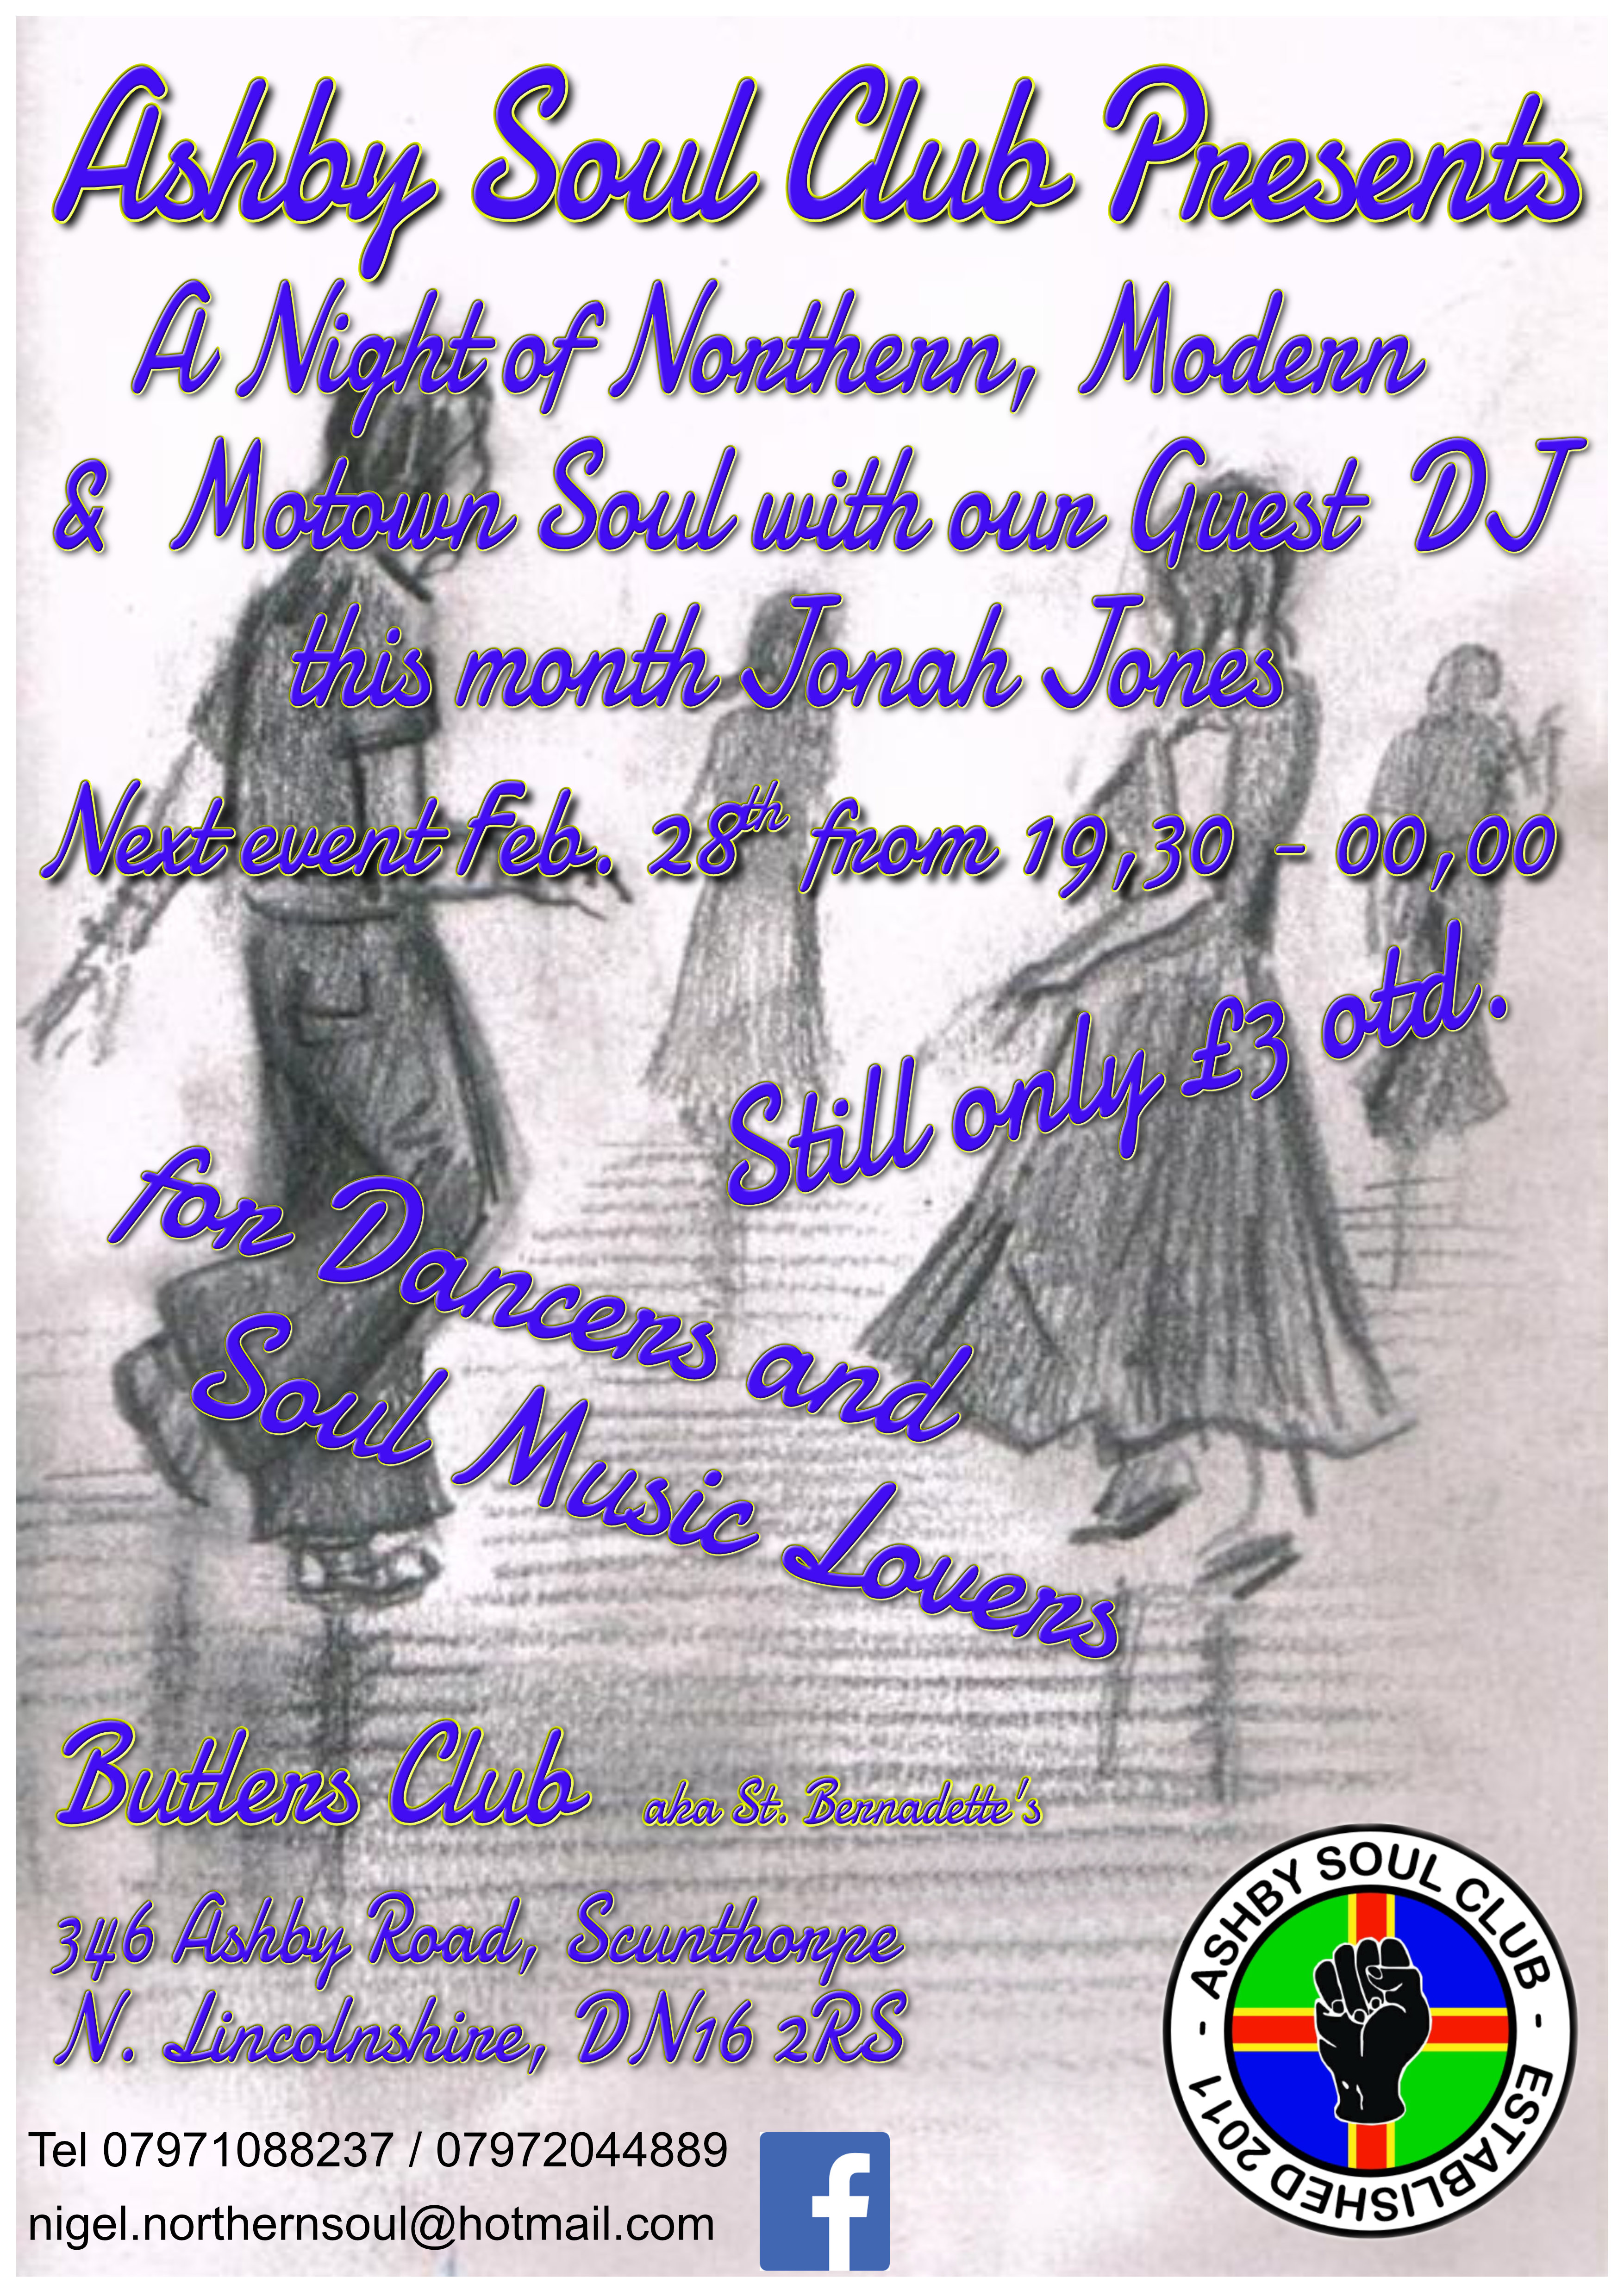 Scunthorpe Northern Motown Modern Soul Night flyer